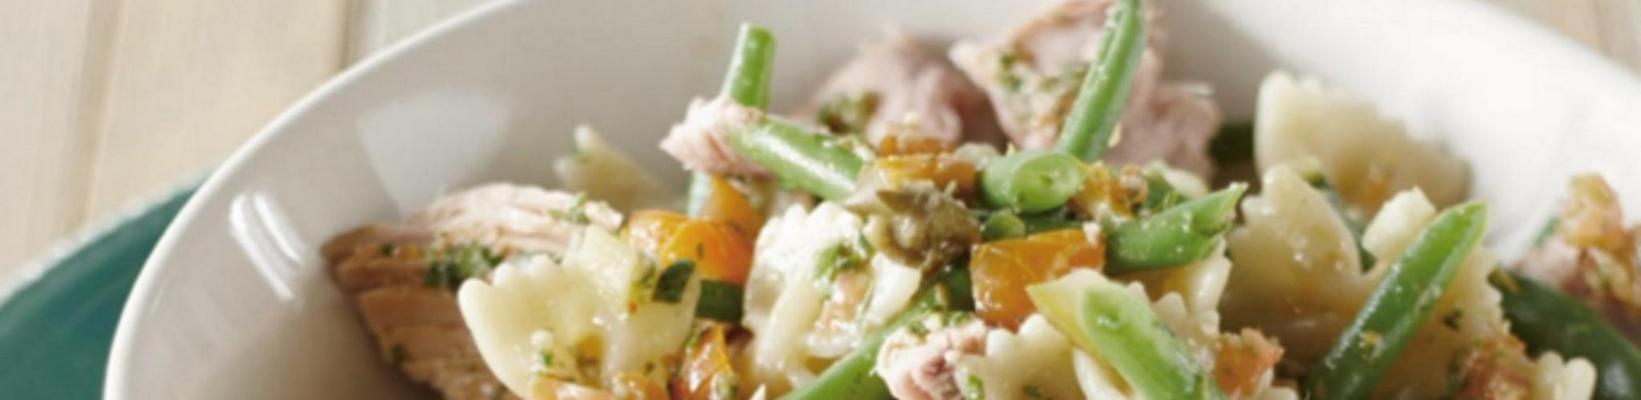 Italian tuna salad with tomato dressing